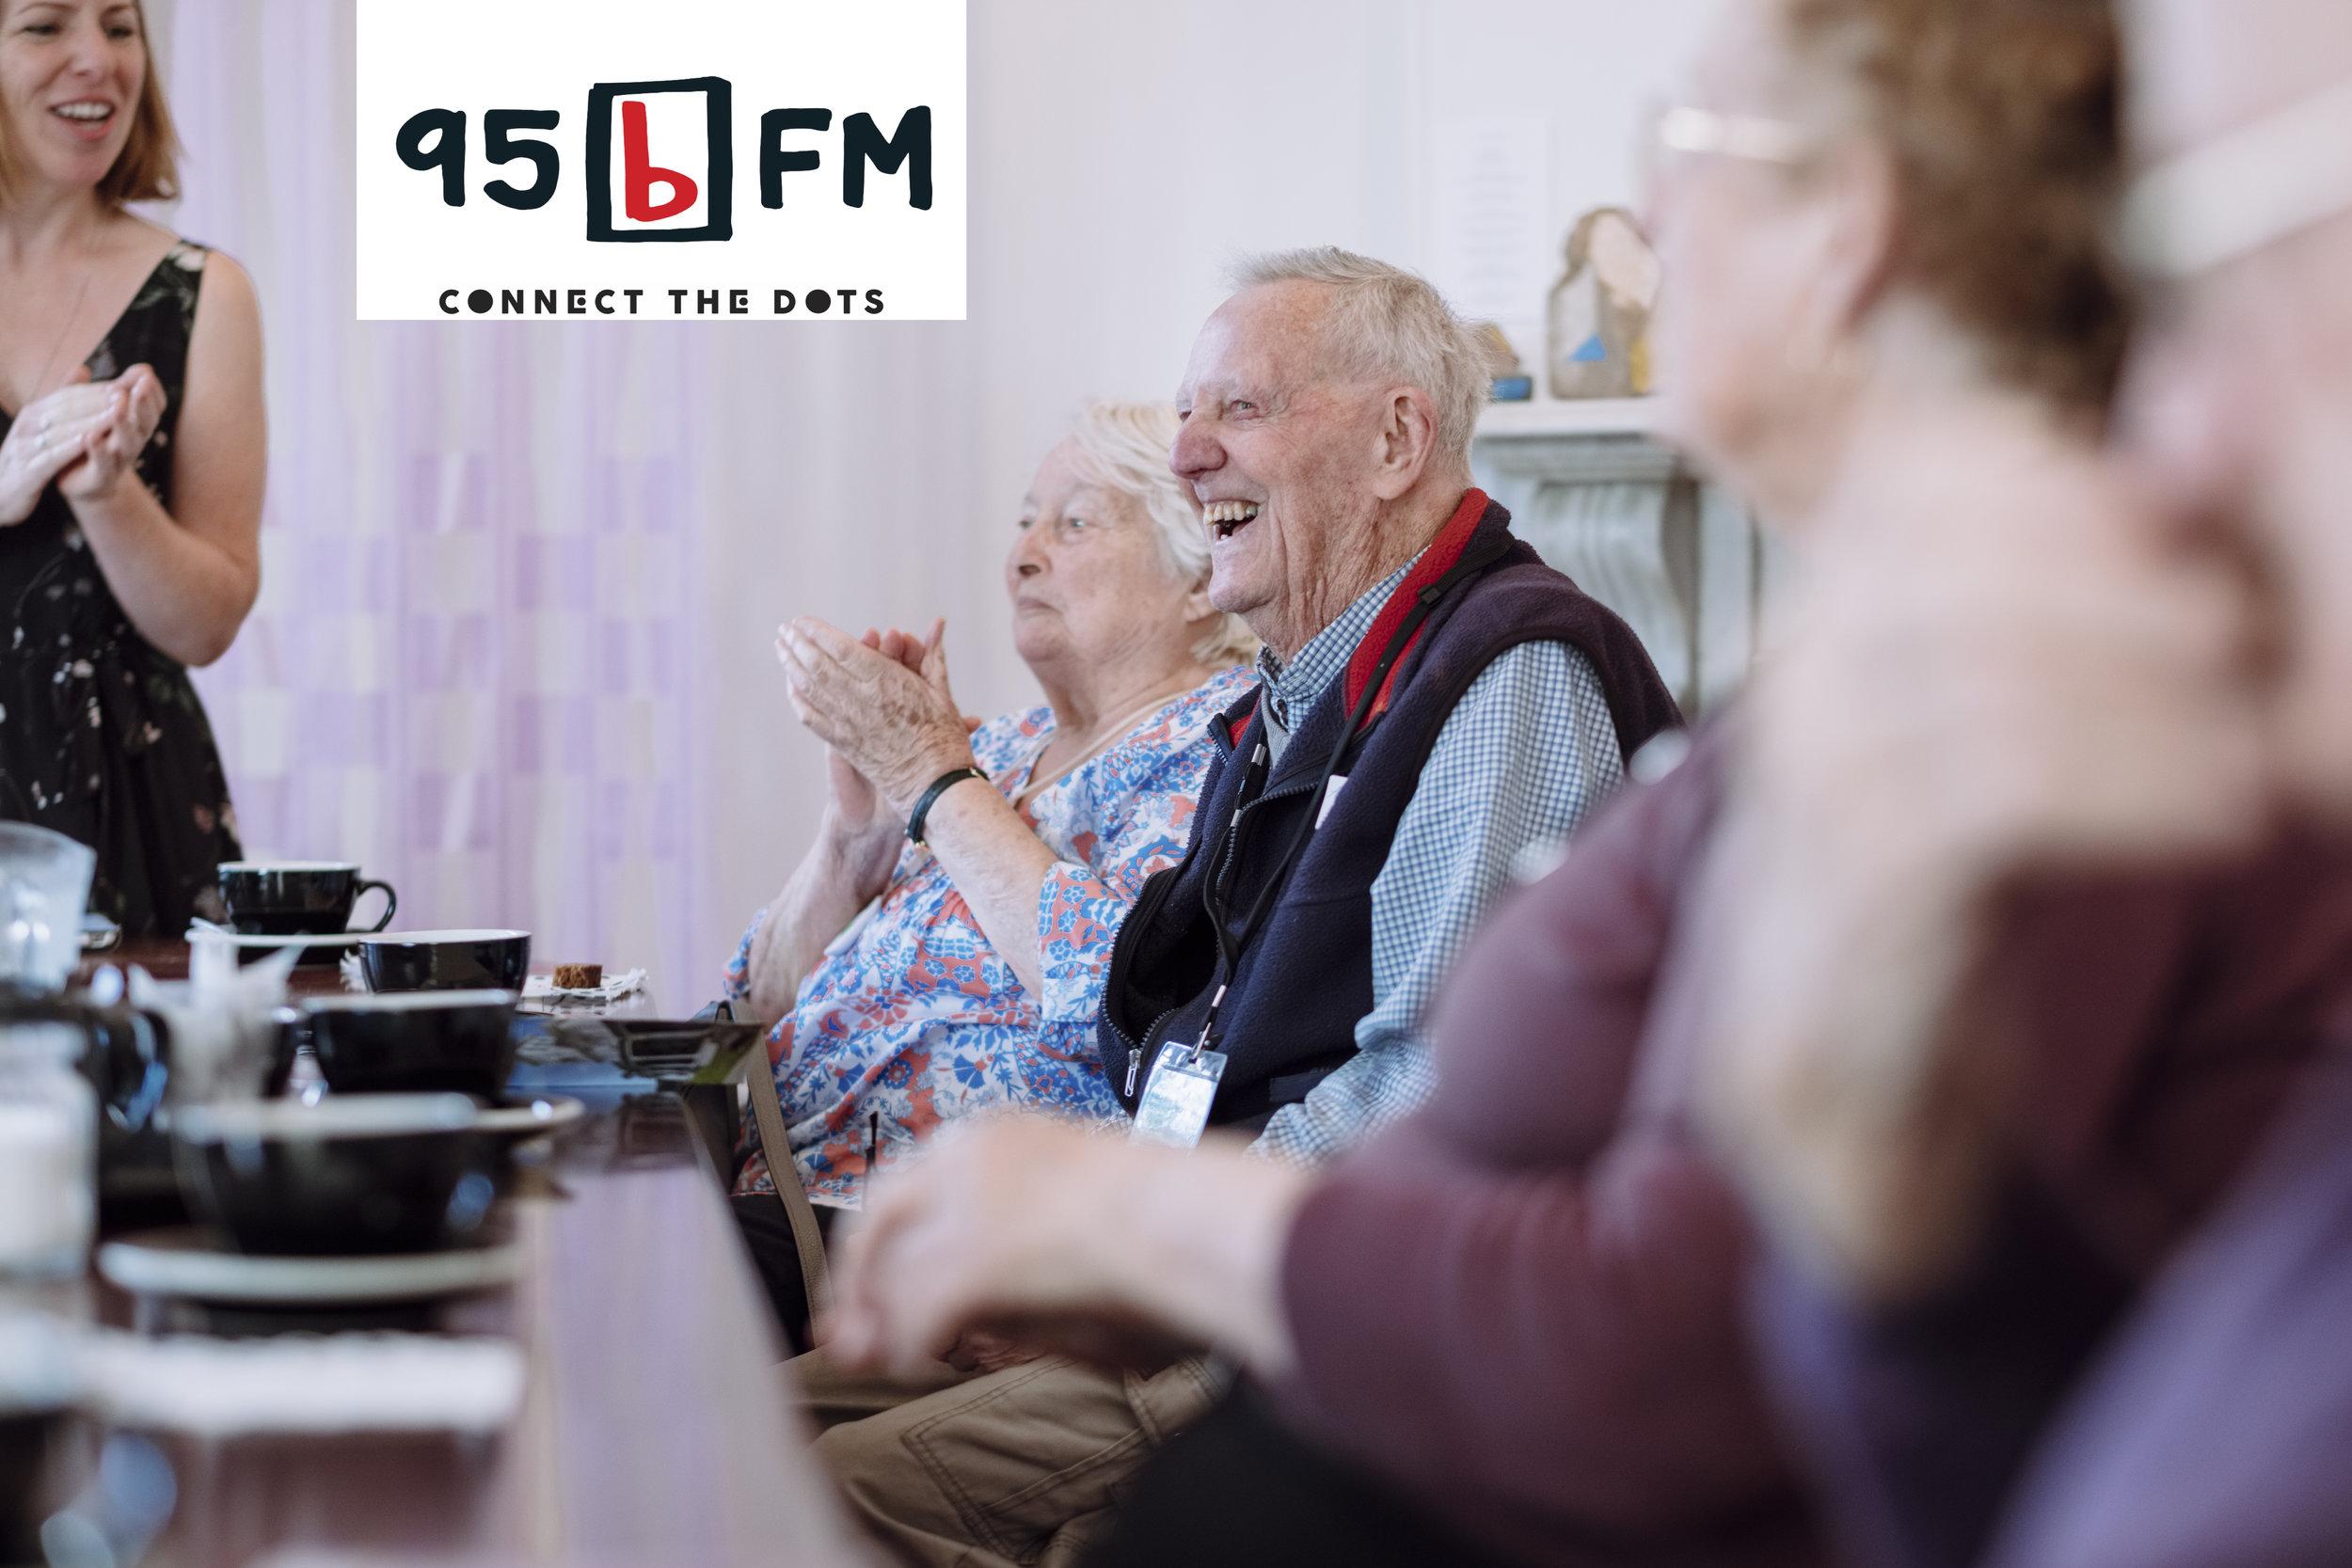 bFM - CTD interview march 2018